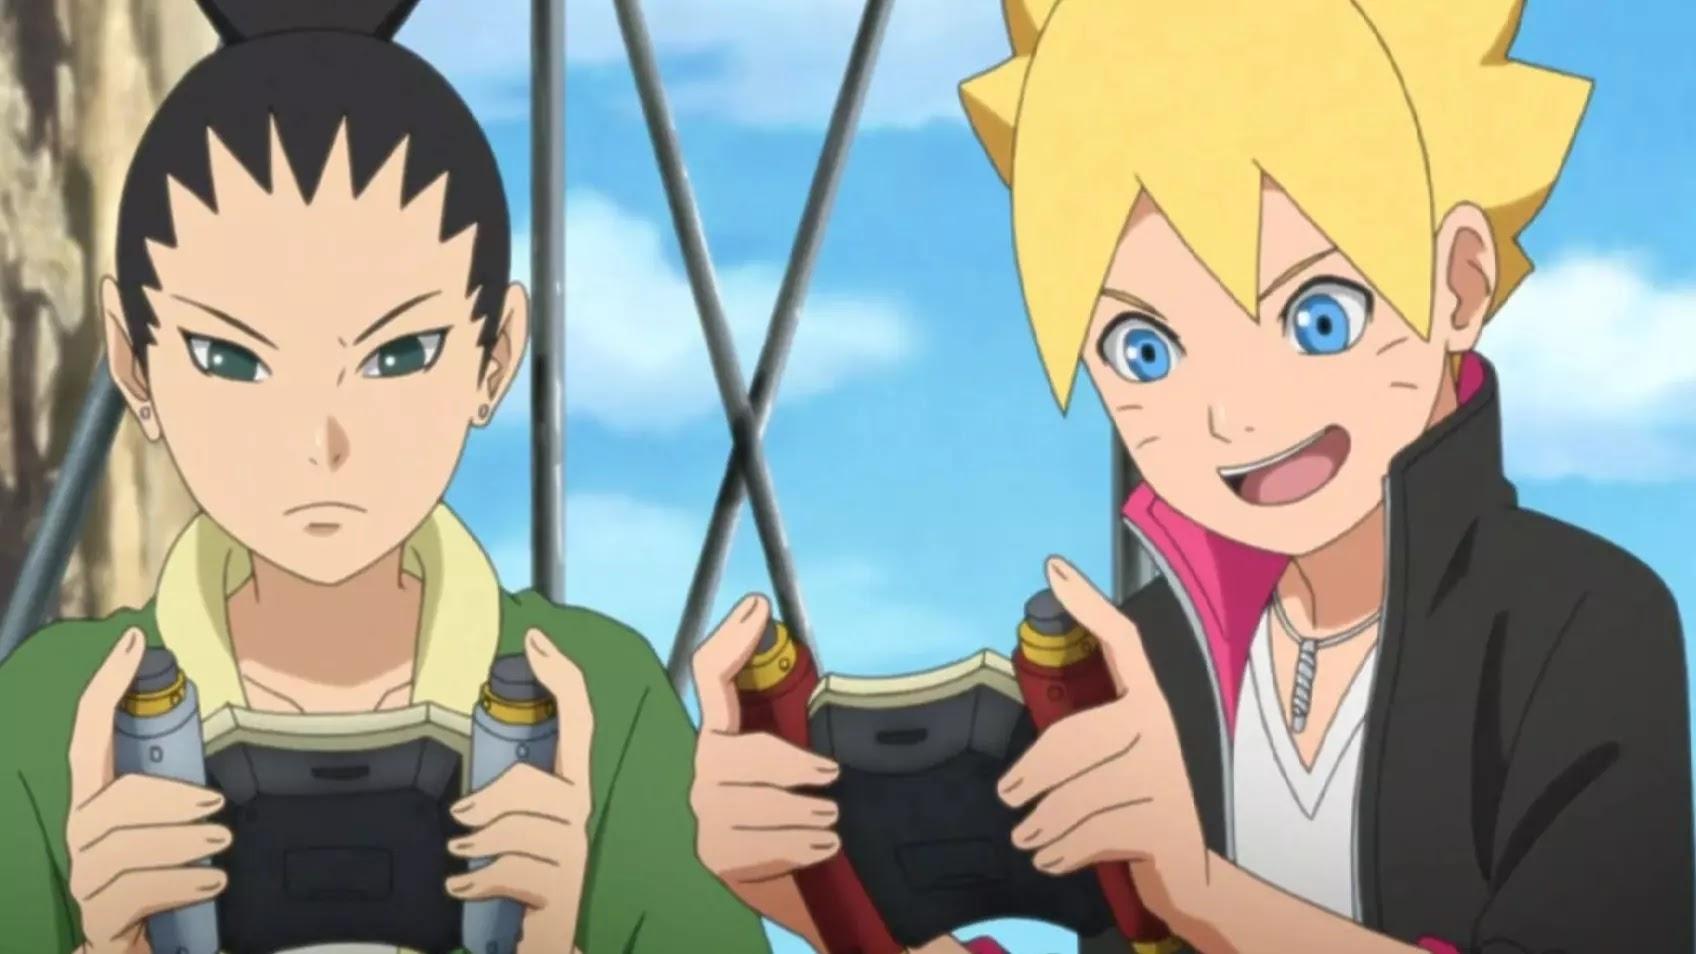 7 Fakta Shikadai Nara, Anak Tunggal Shikamaru dan Temari di Boruto